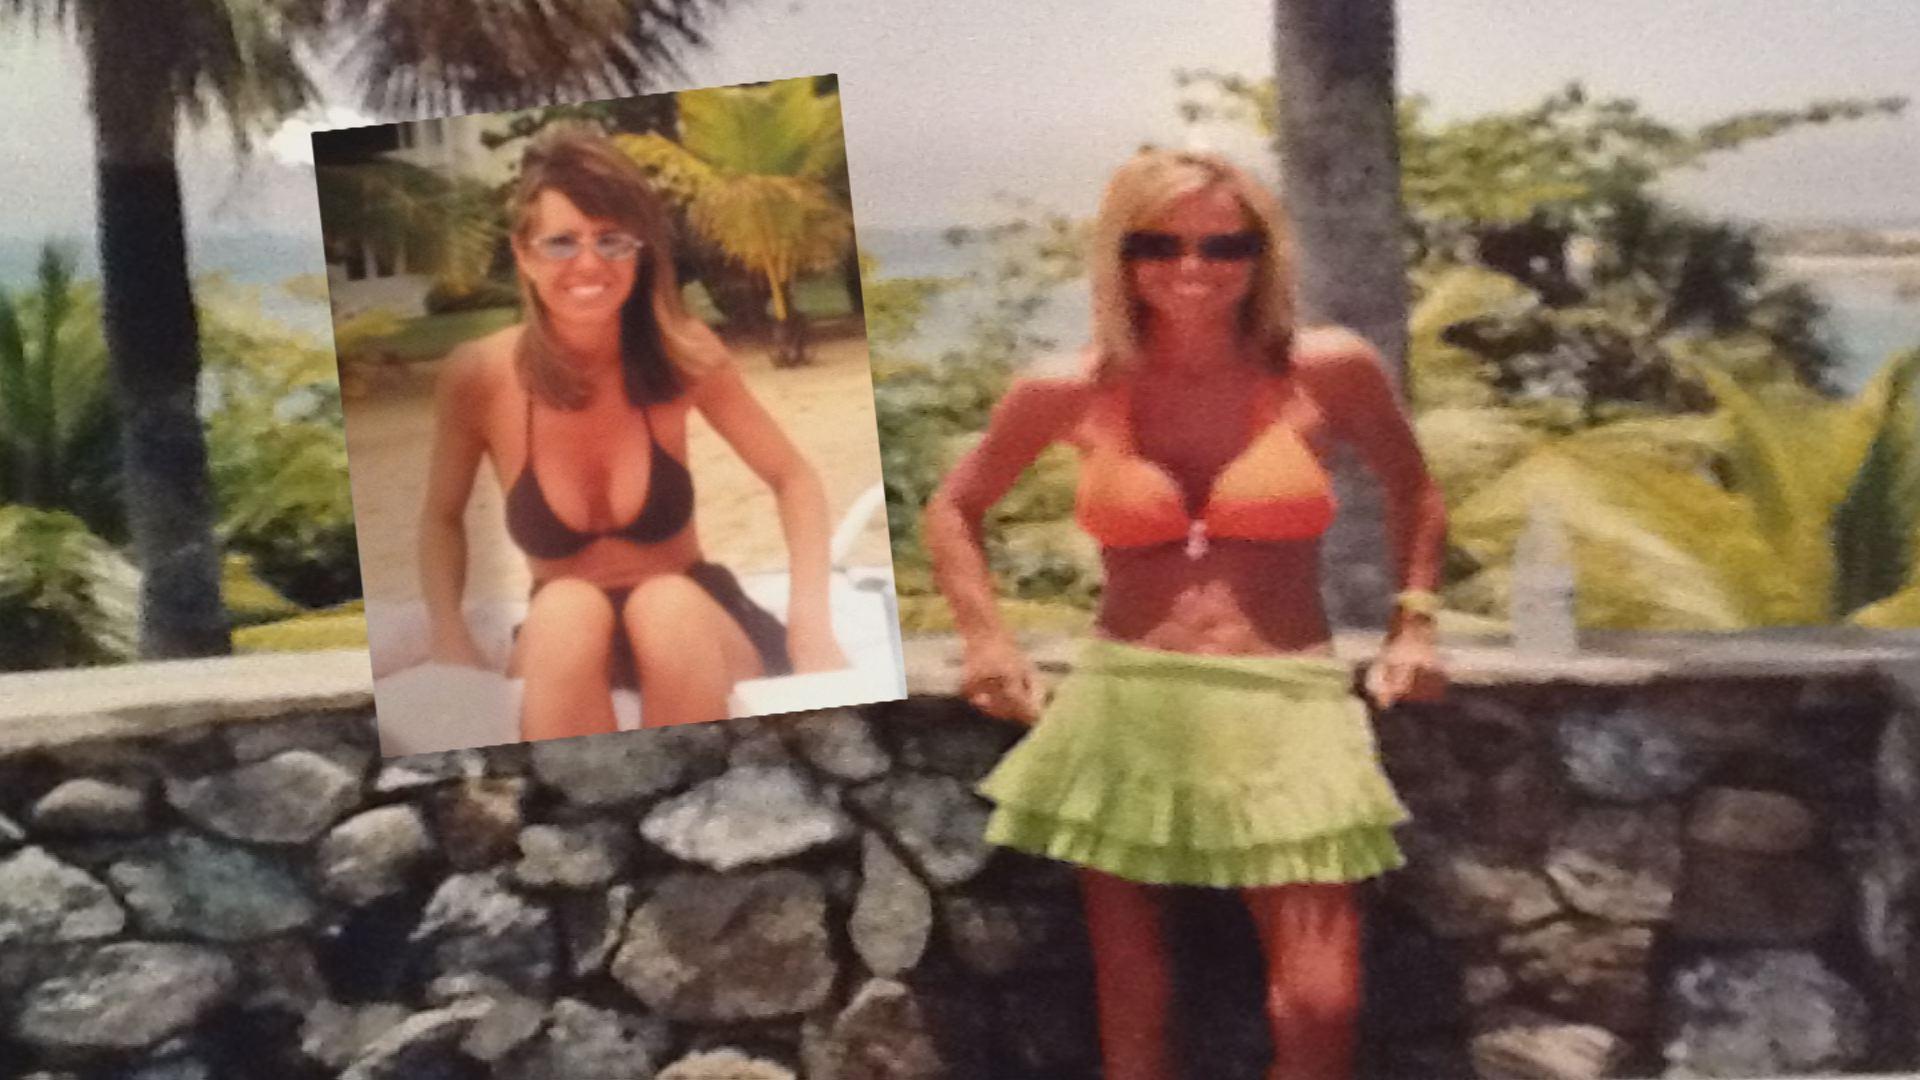 Paula Blades chose saline breast implants in 1992.